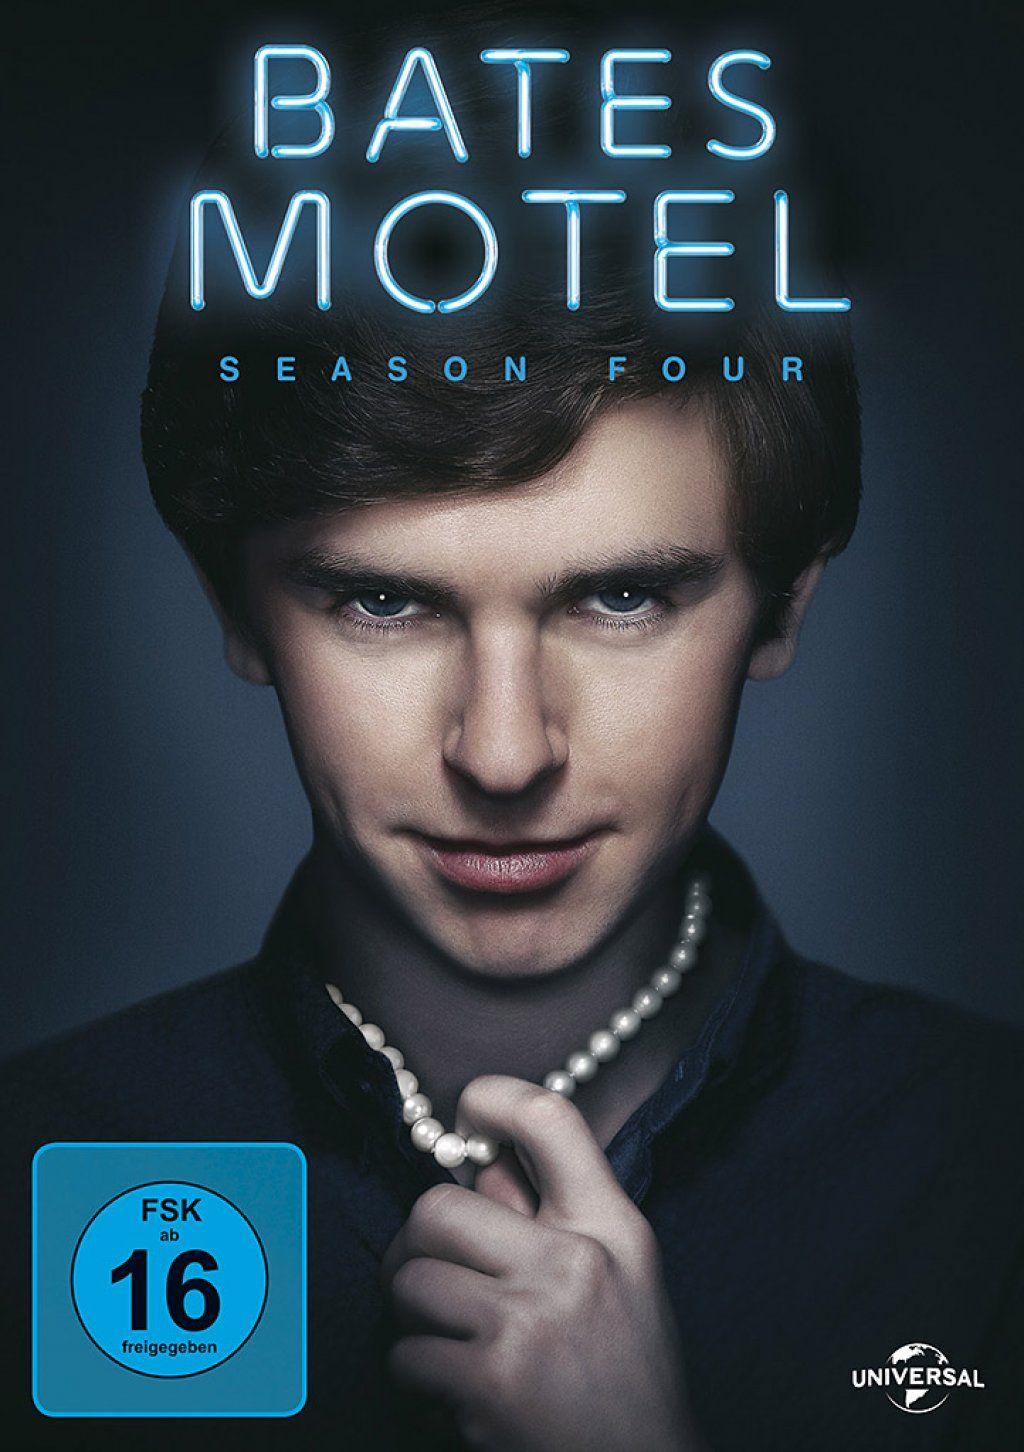 Bates Motel - Season 4 (3 Discs)